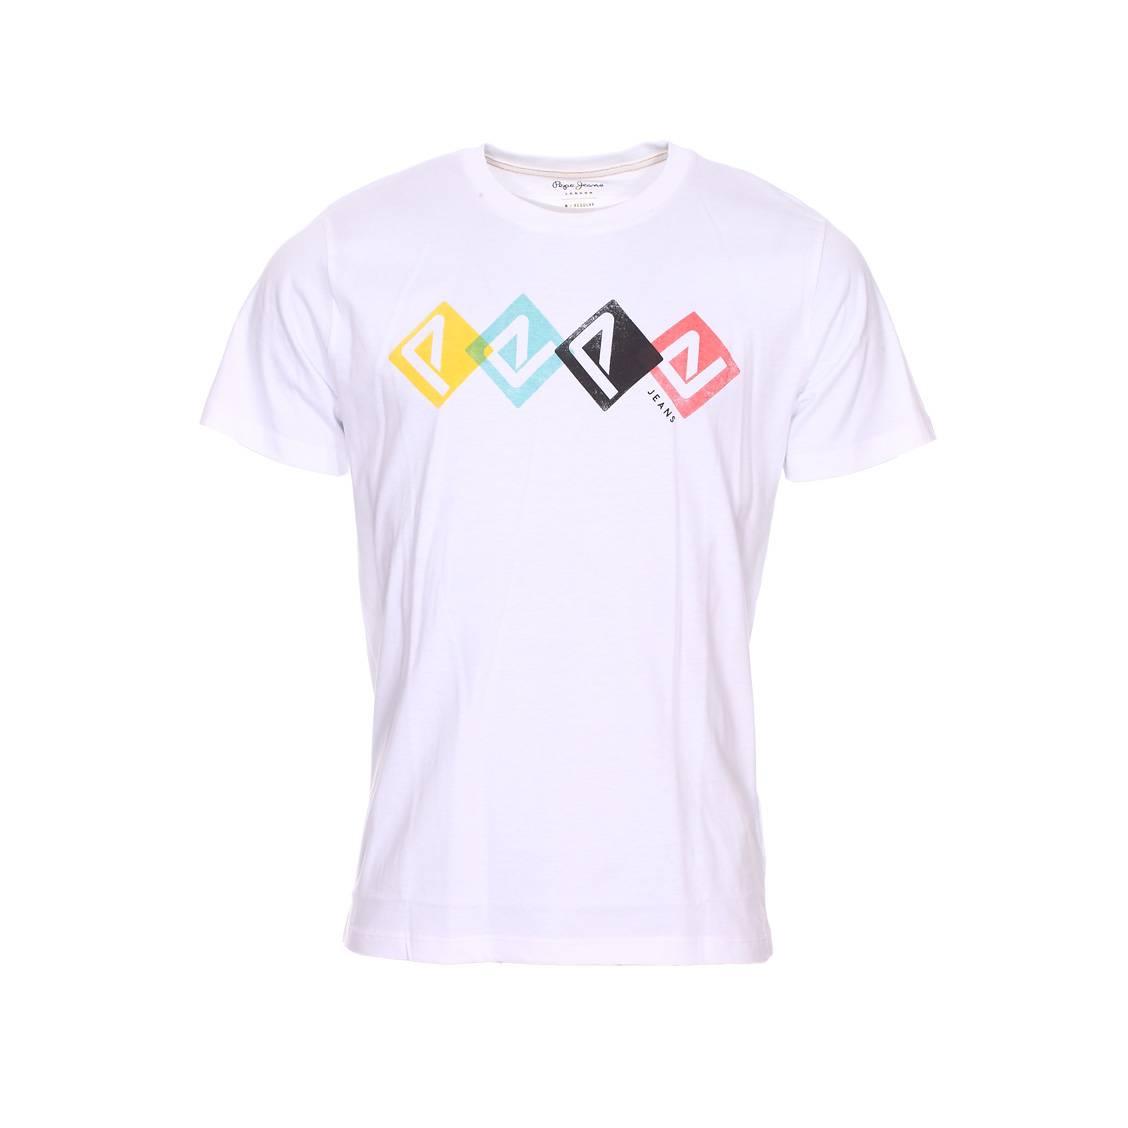 Tee-shirt col rond  joel en coton blanc floqué